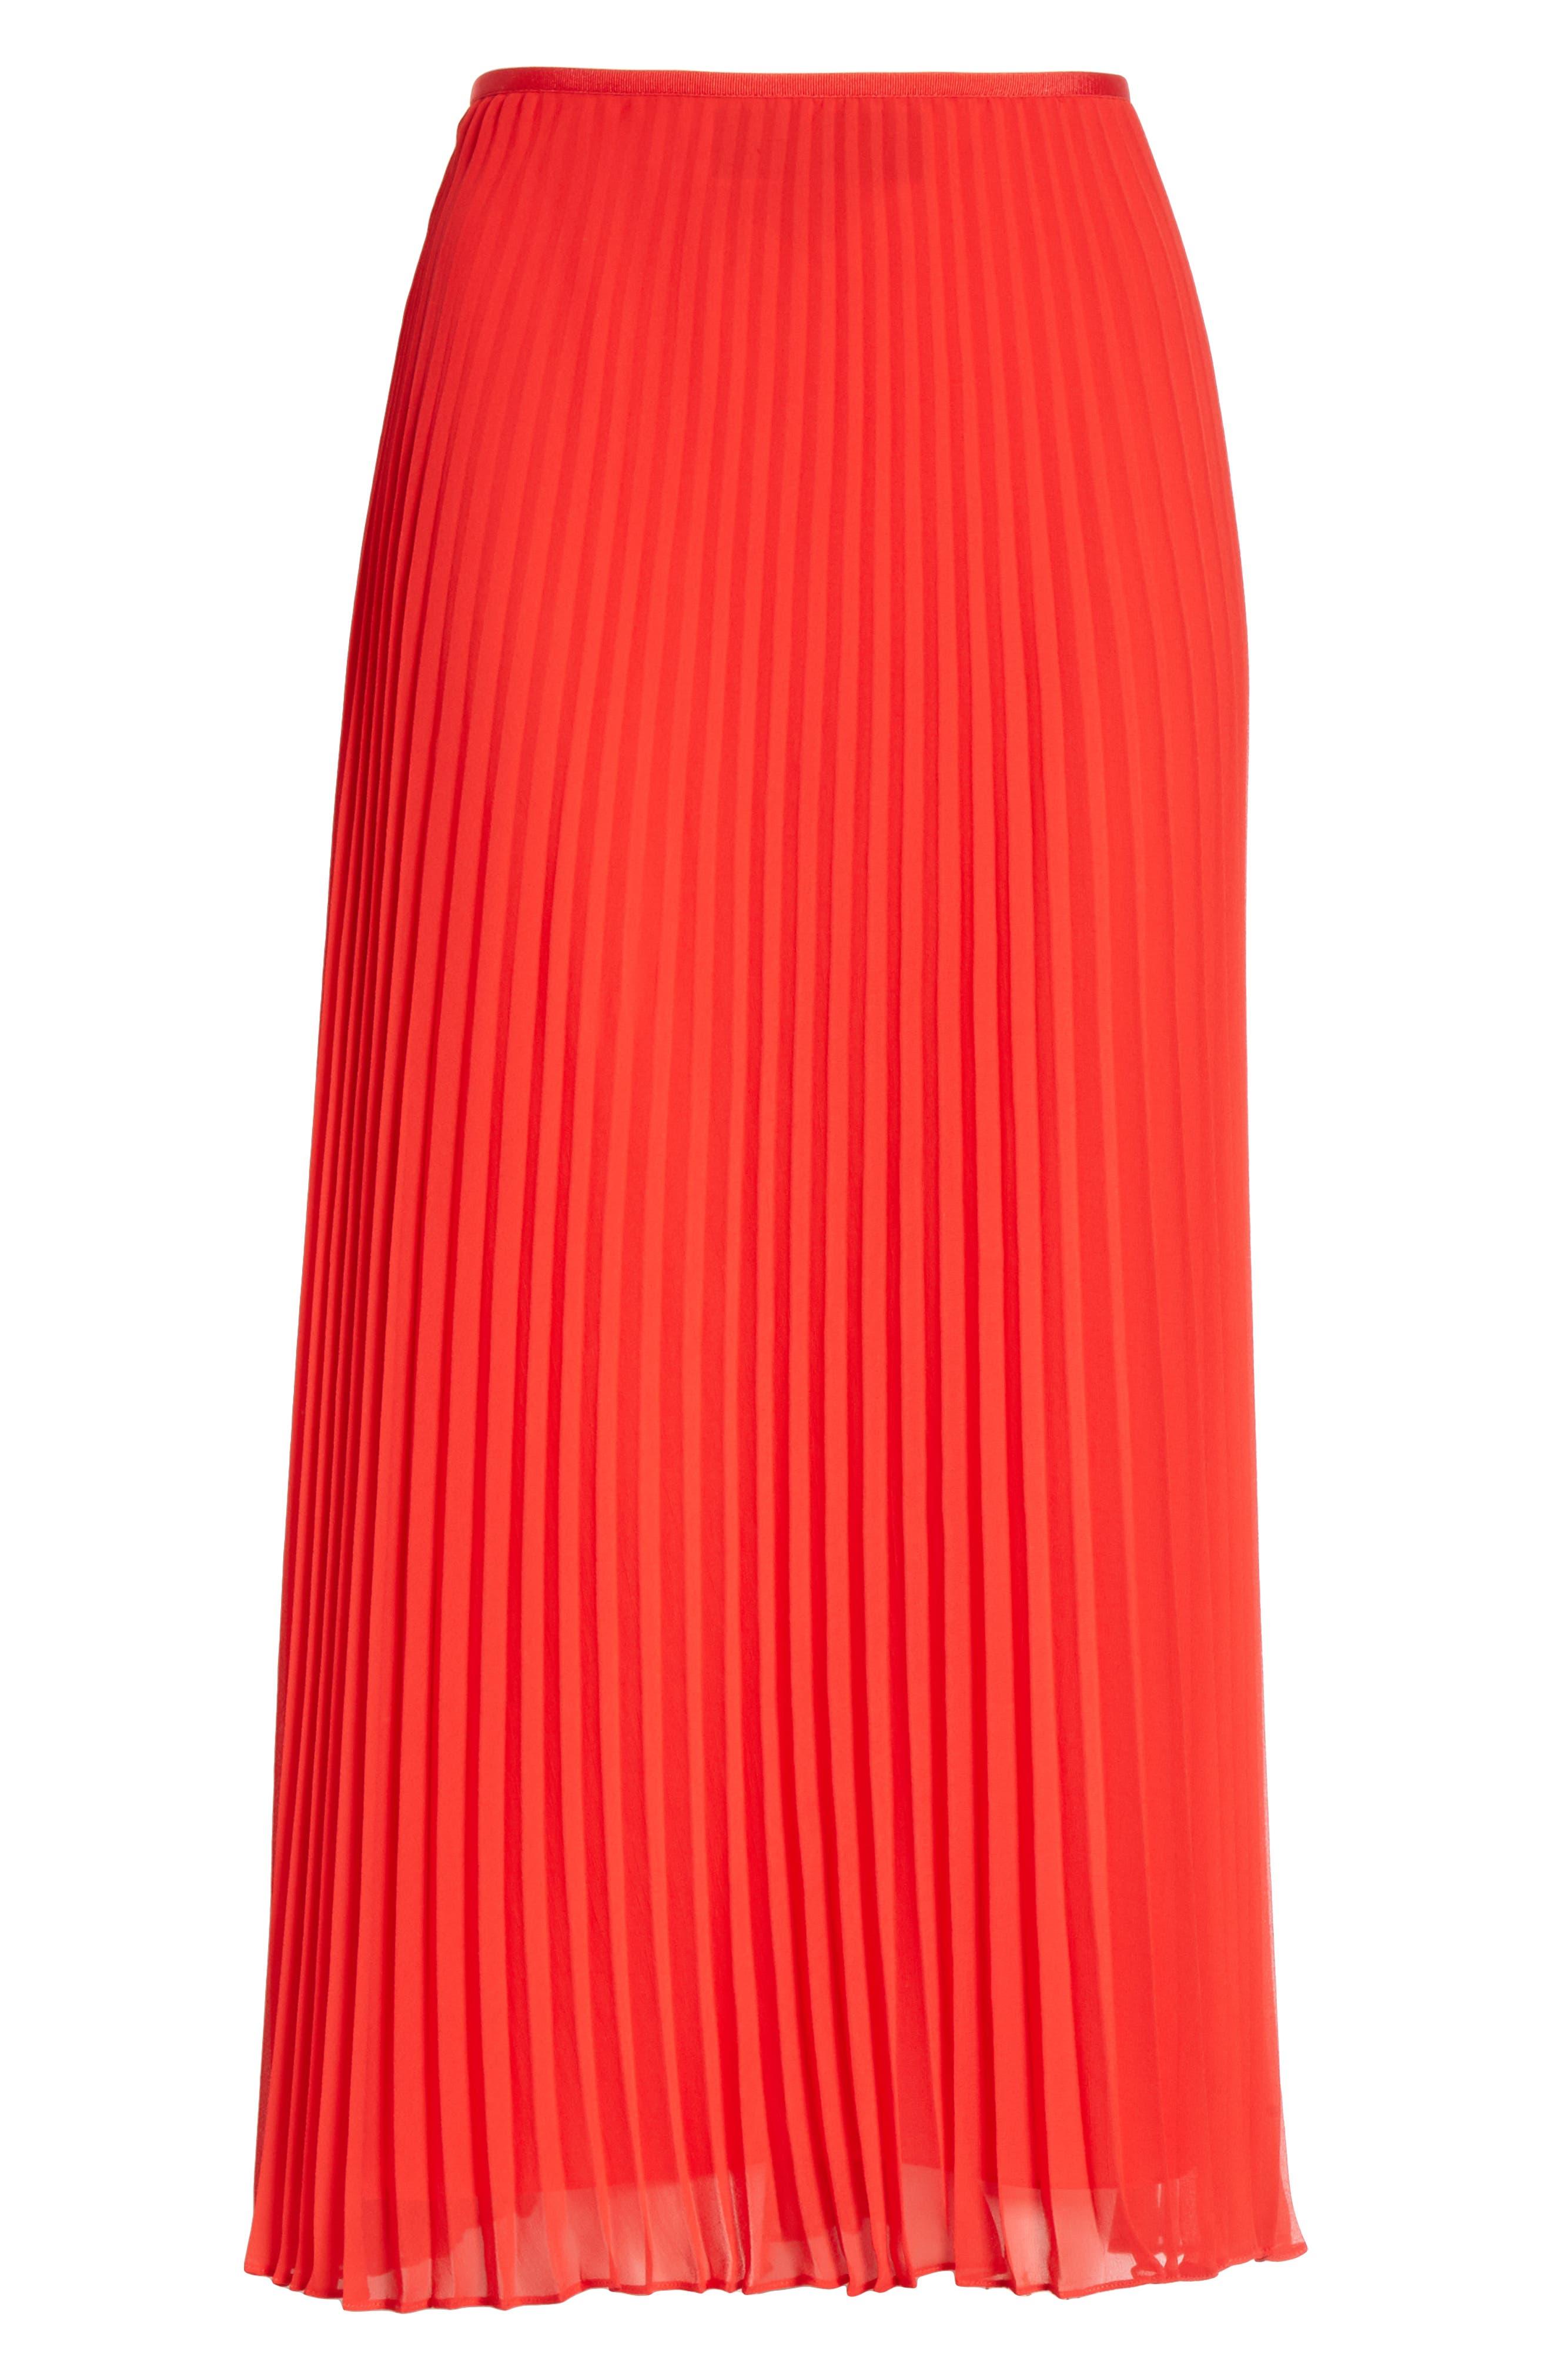 POLO RALPH LAUREN, Pleat Midi Skirt, Alternate thumbnail 6, color, PANDORA RED